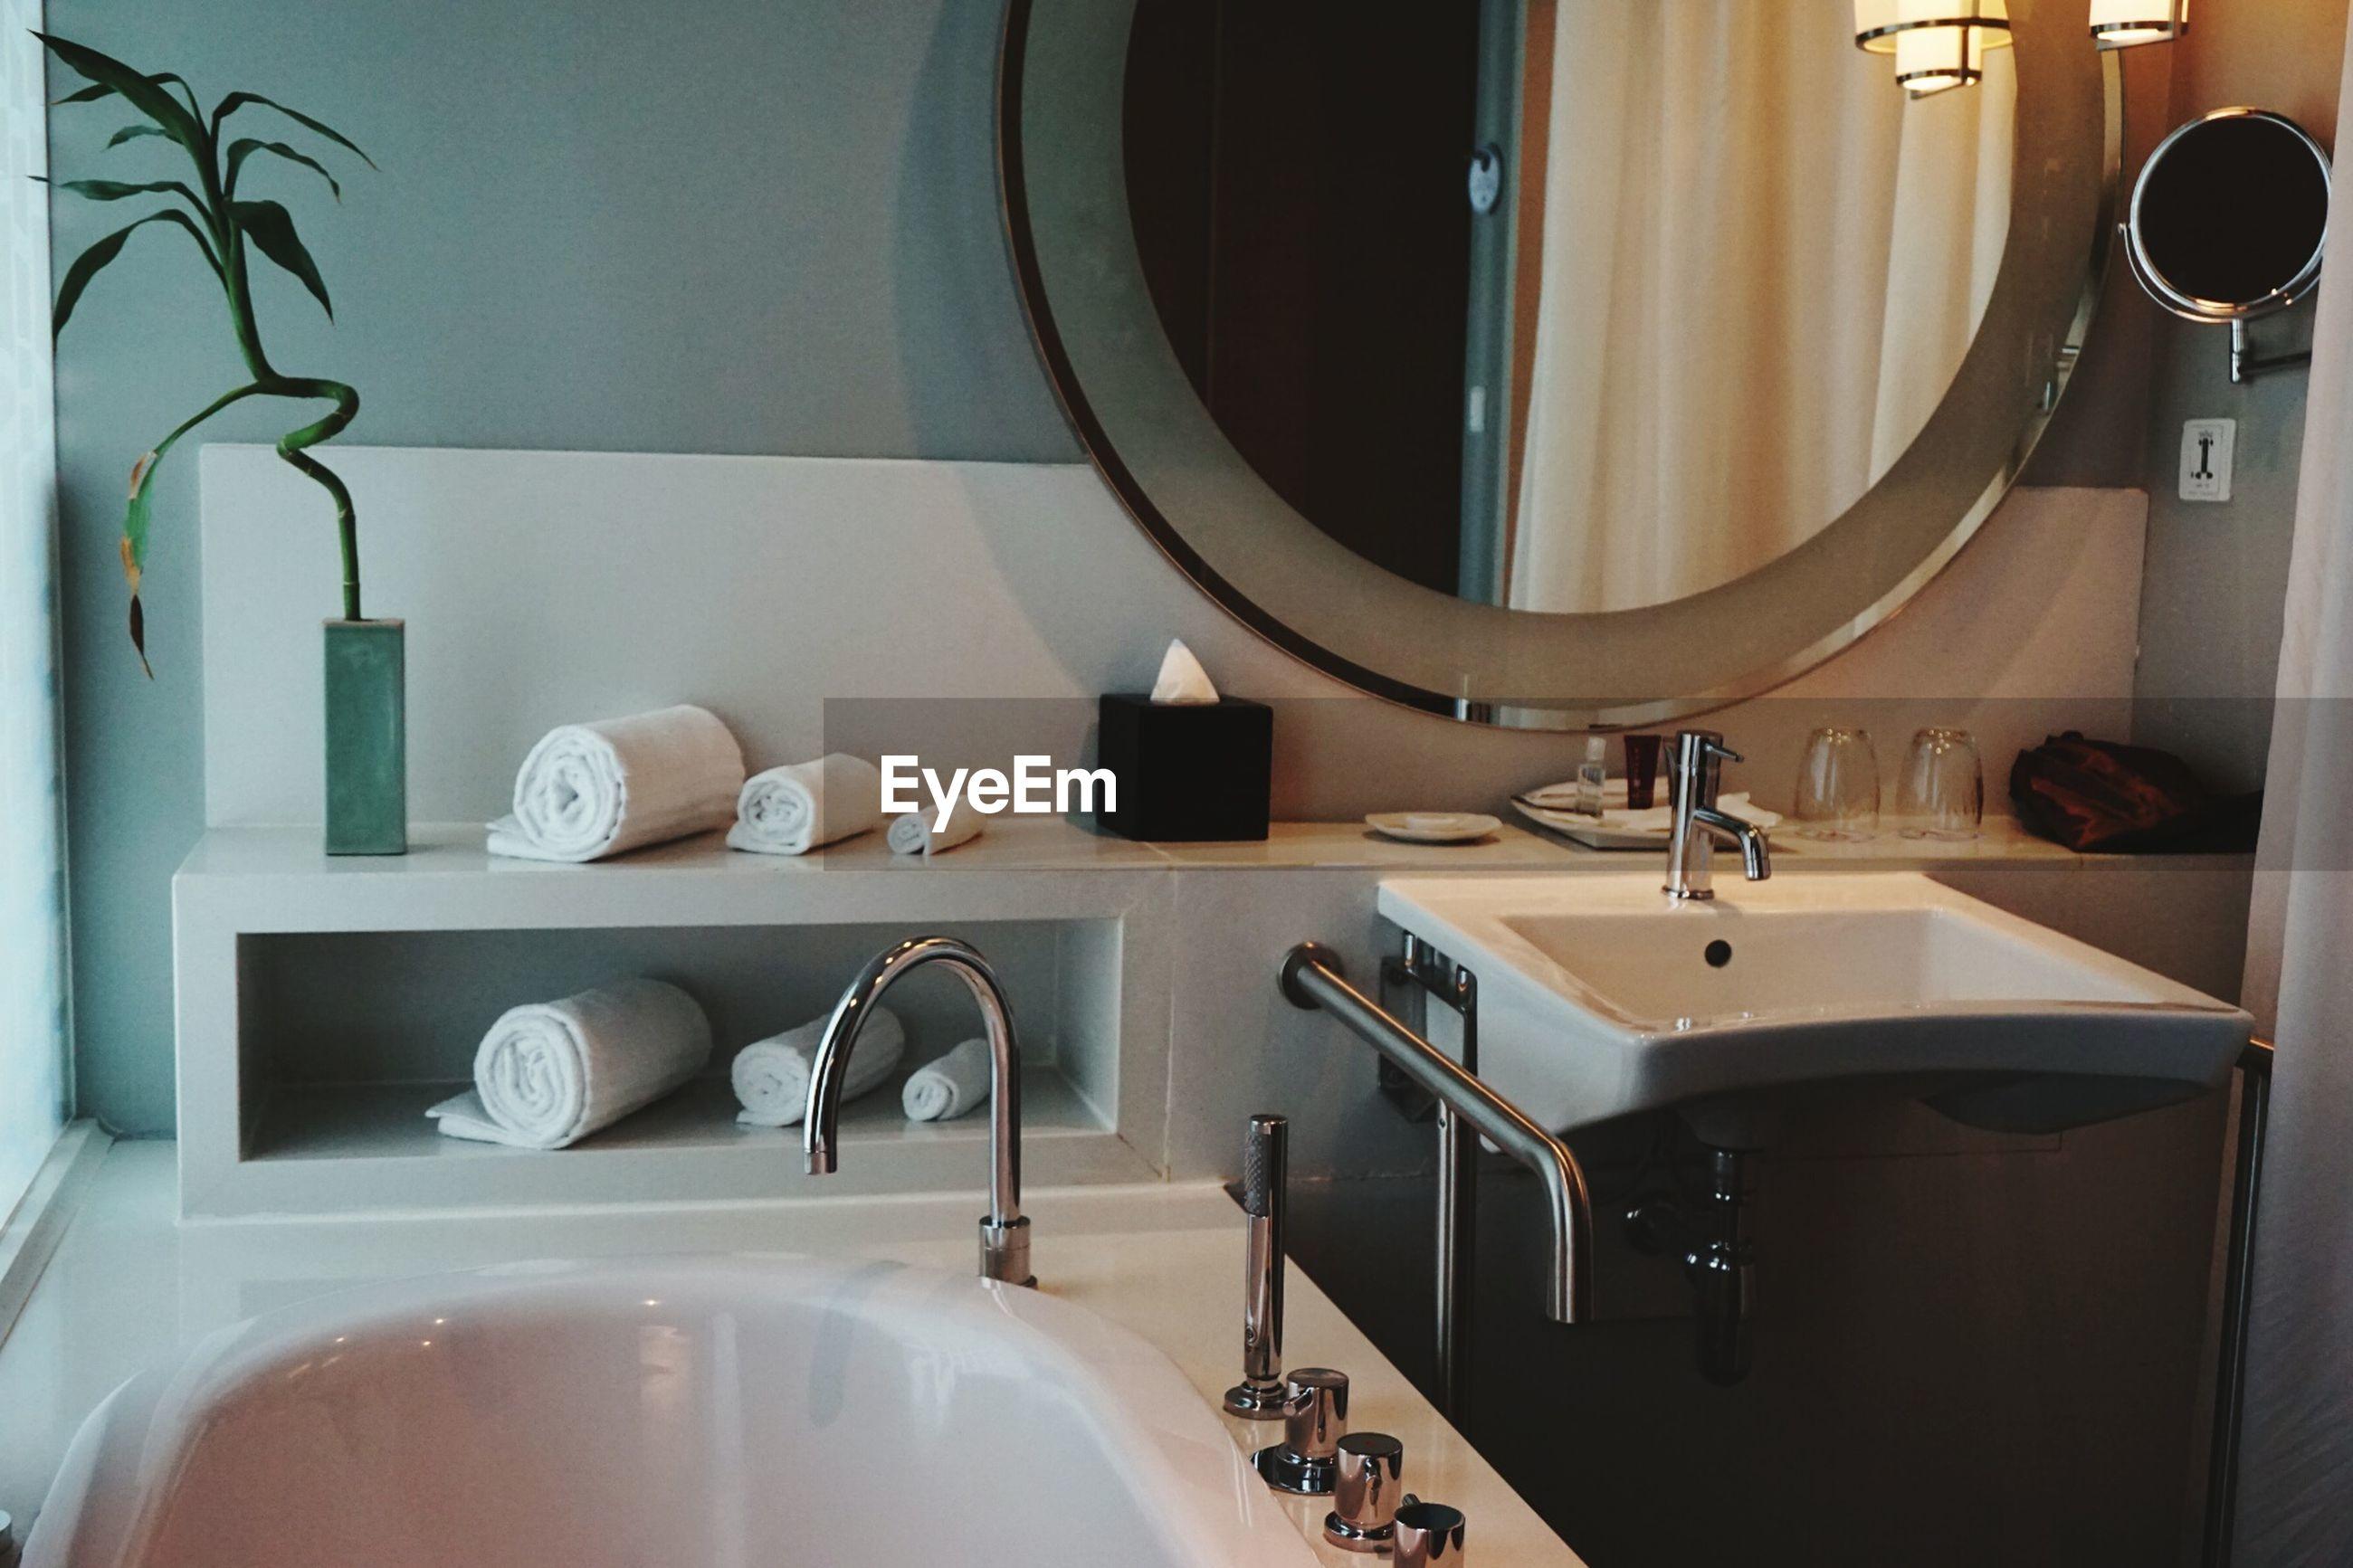 VIEW OF ILLUMINATED BATHROOM